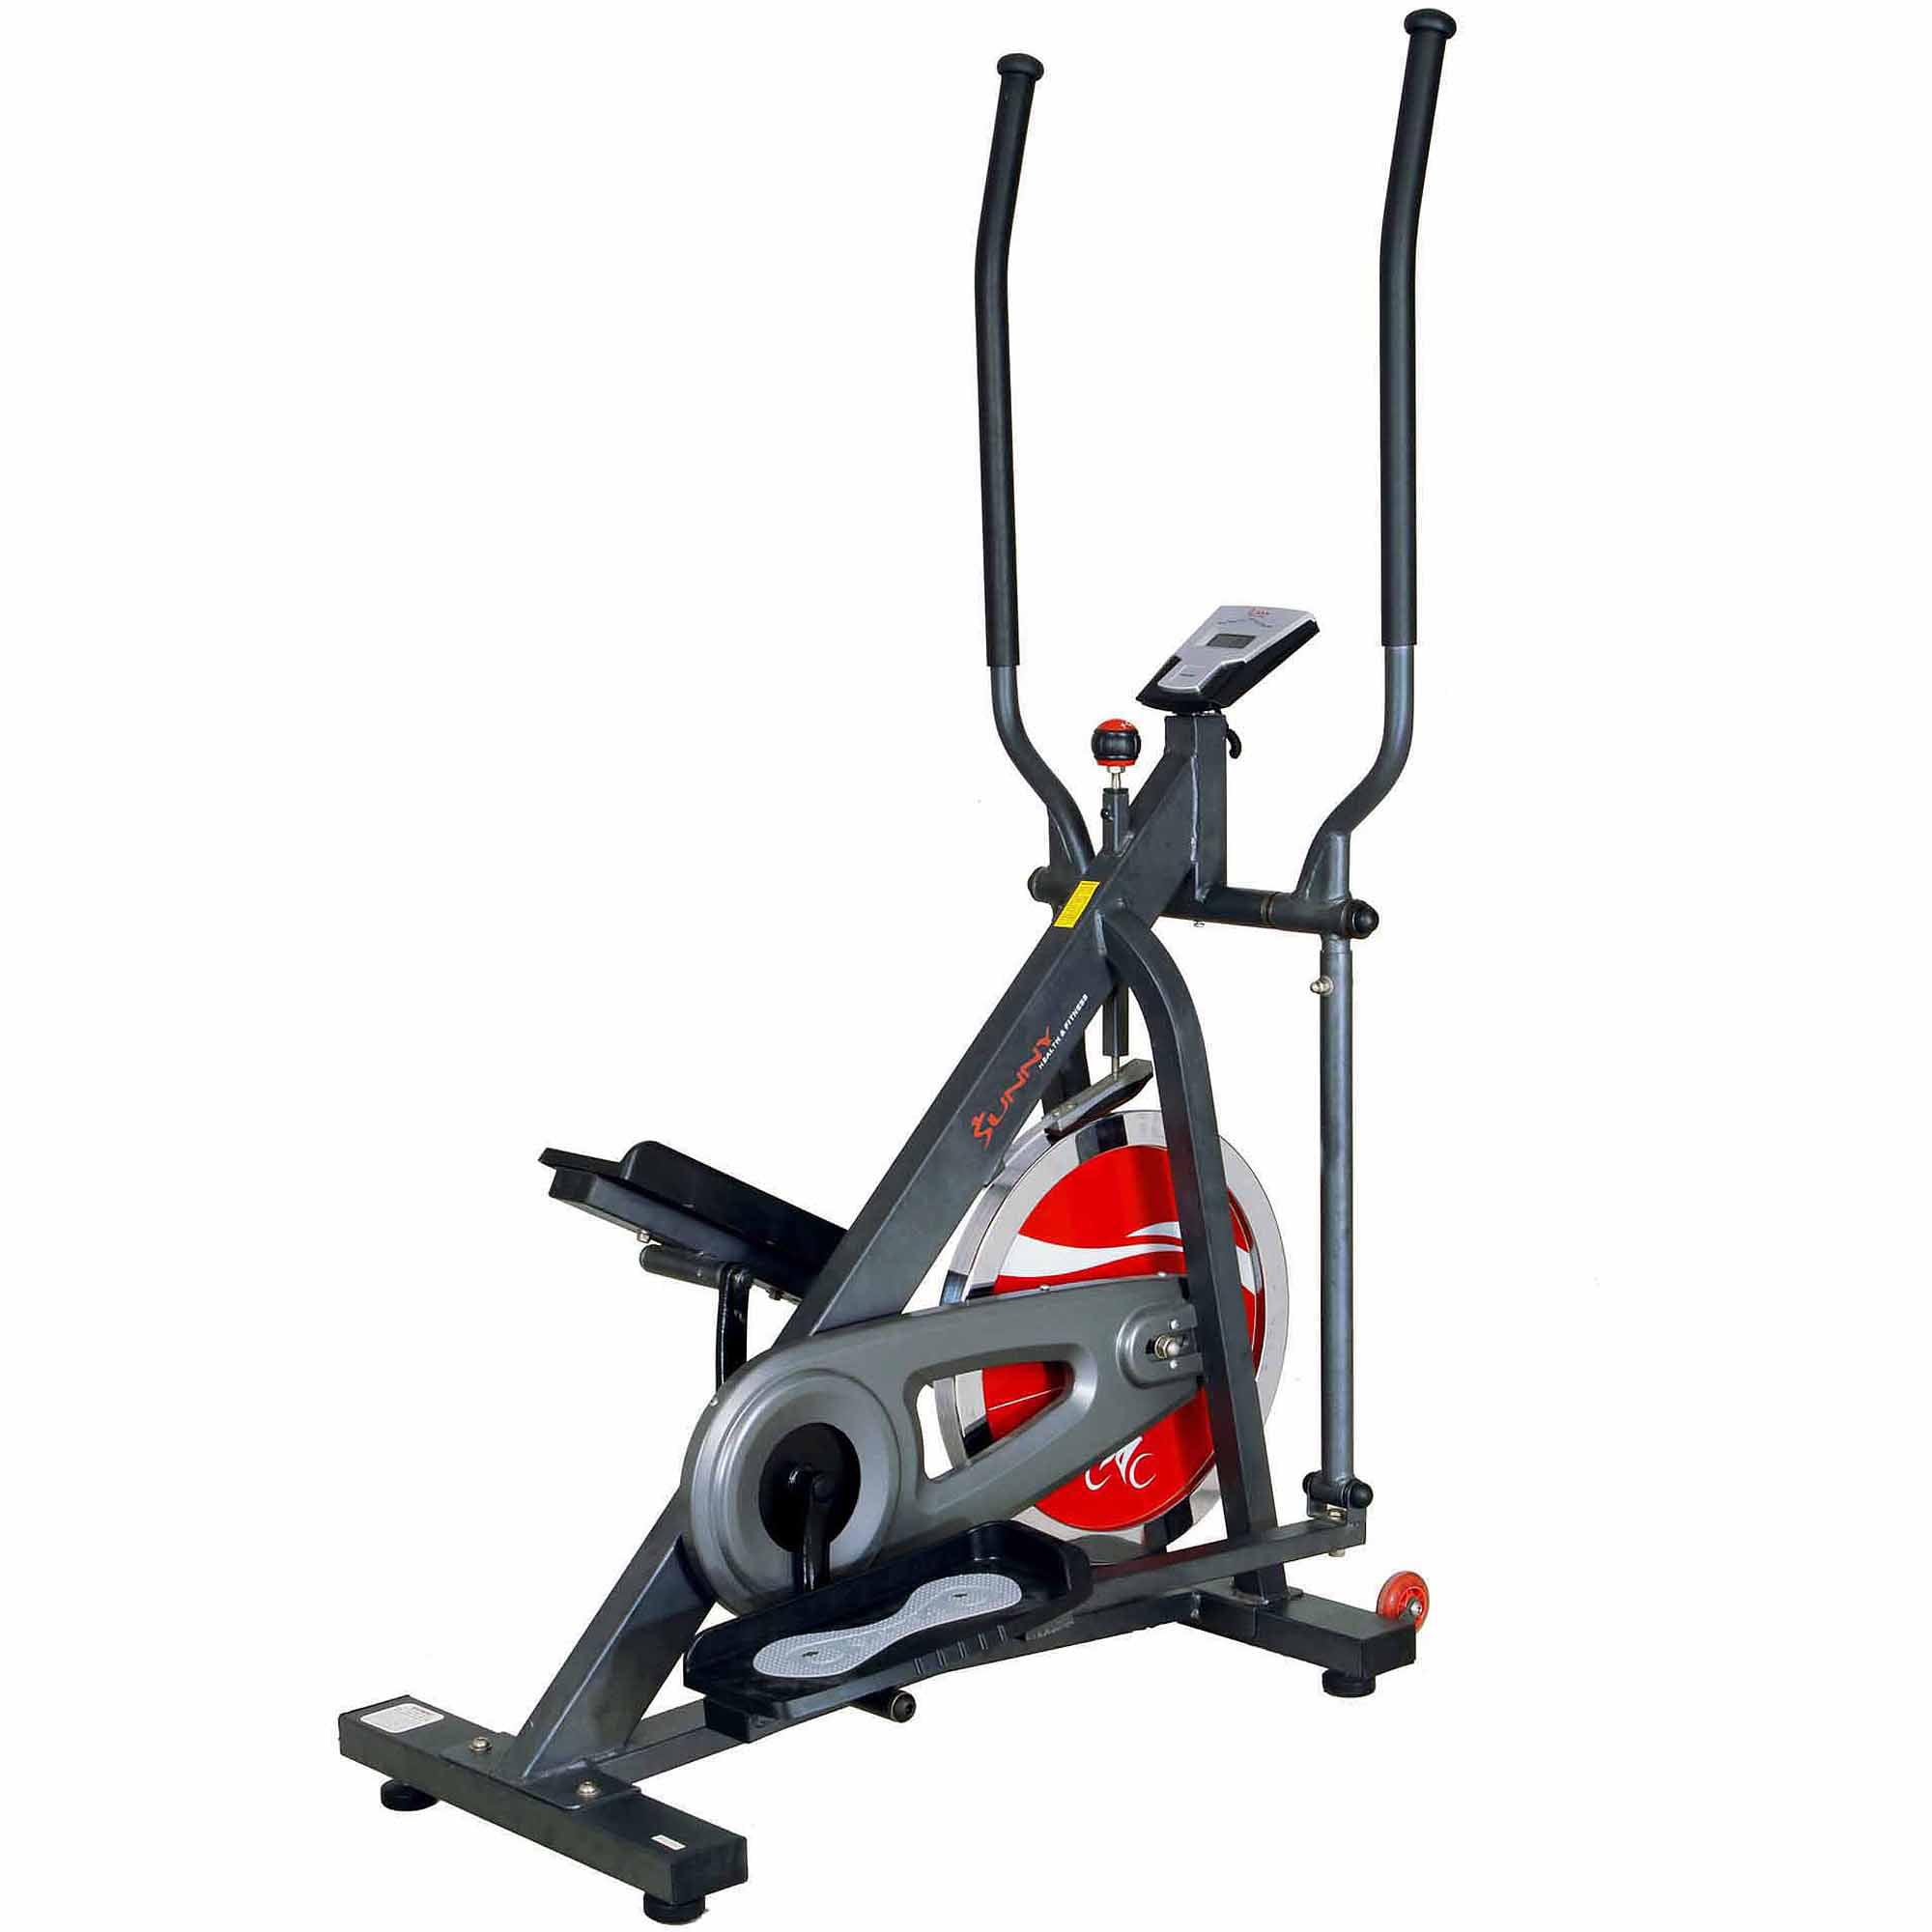 Sunny Health & Fitness SF-E2310 44lb Chain Drive Flywheel Elliptical Trainer Elliptical Machine